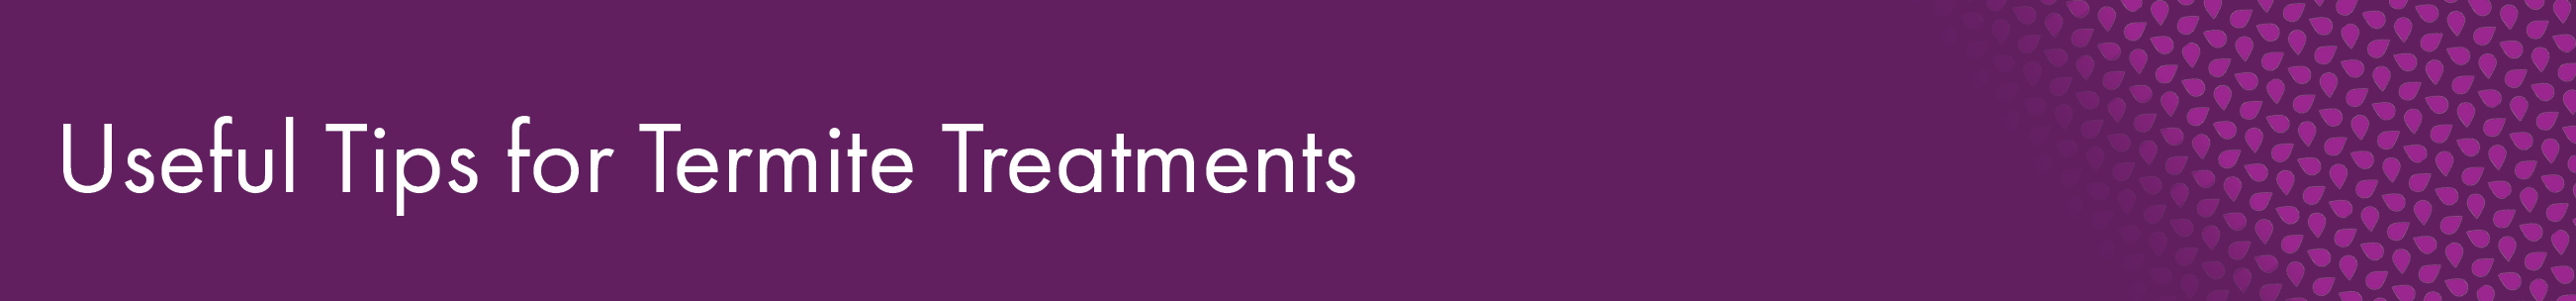 Headline.Tips.termite.treatments